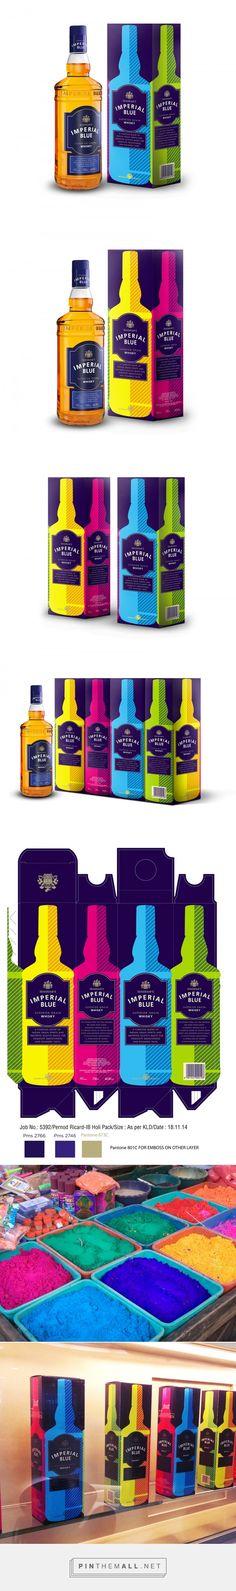 Imperial Blue Holi whisky packaging design by Khurram Haque - http://www.packagingoftheworld.com/2016/10/imperial-blue-holi.html